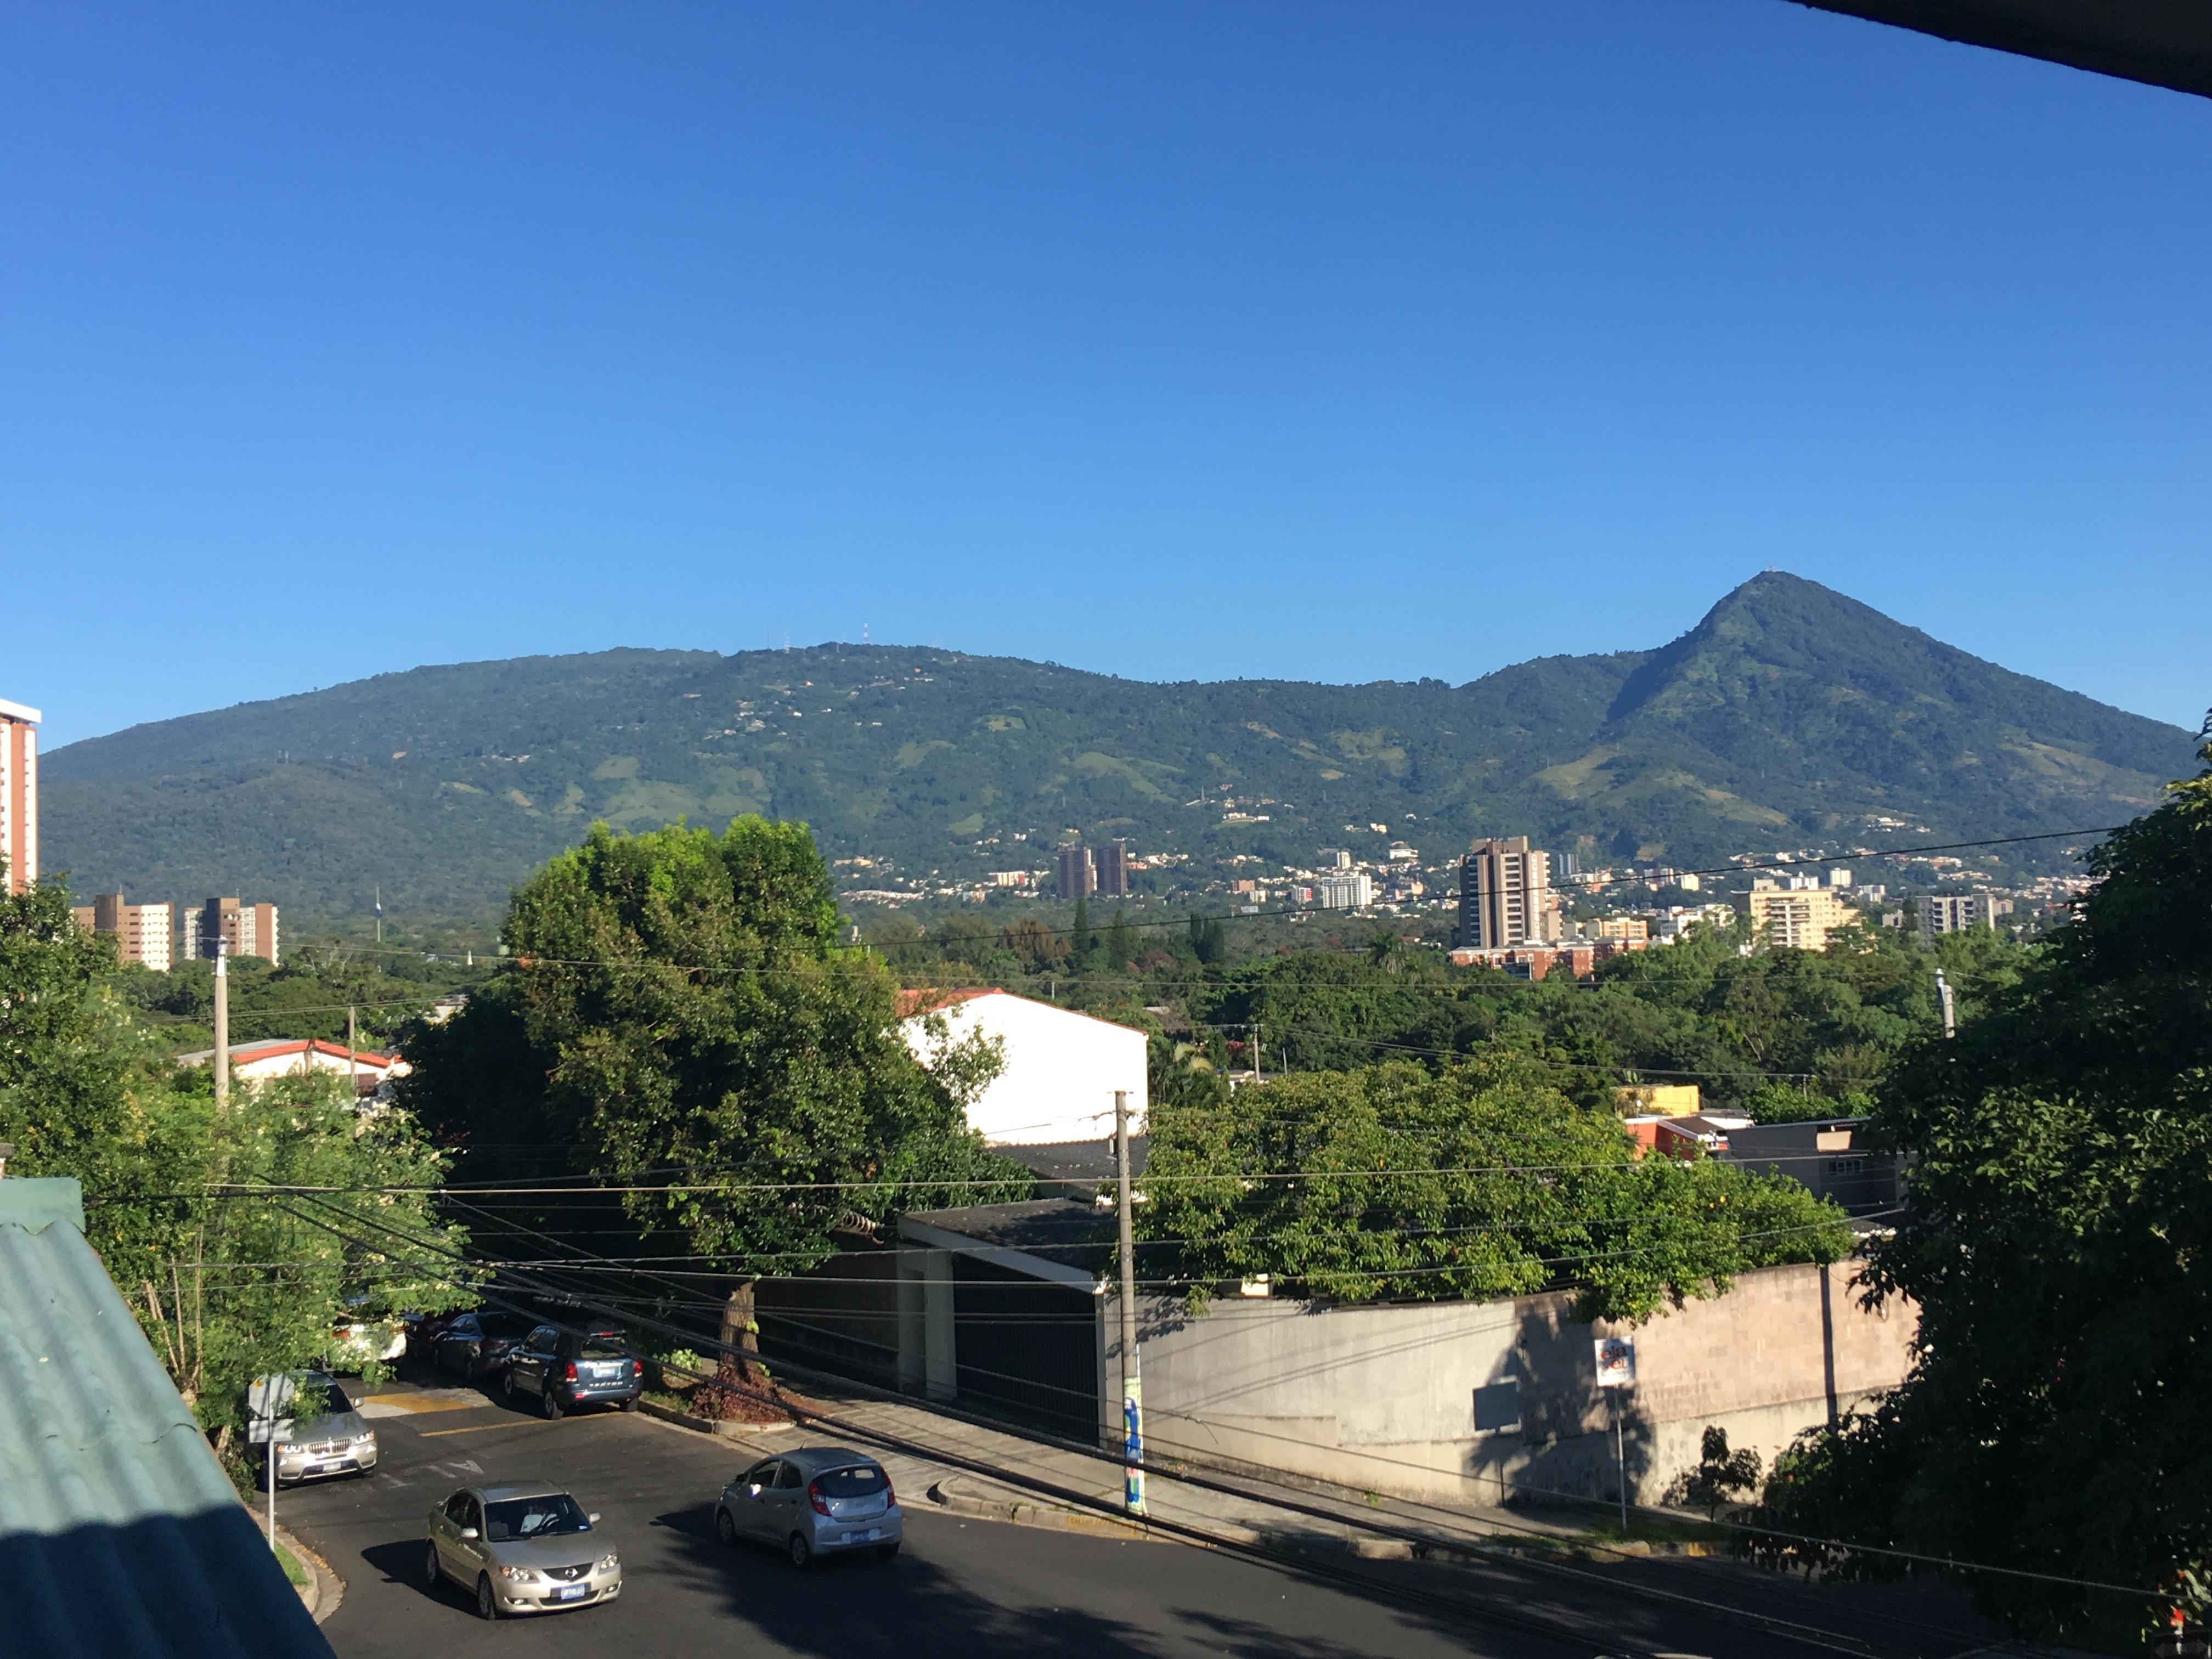 View to Volcan San Salvador